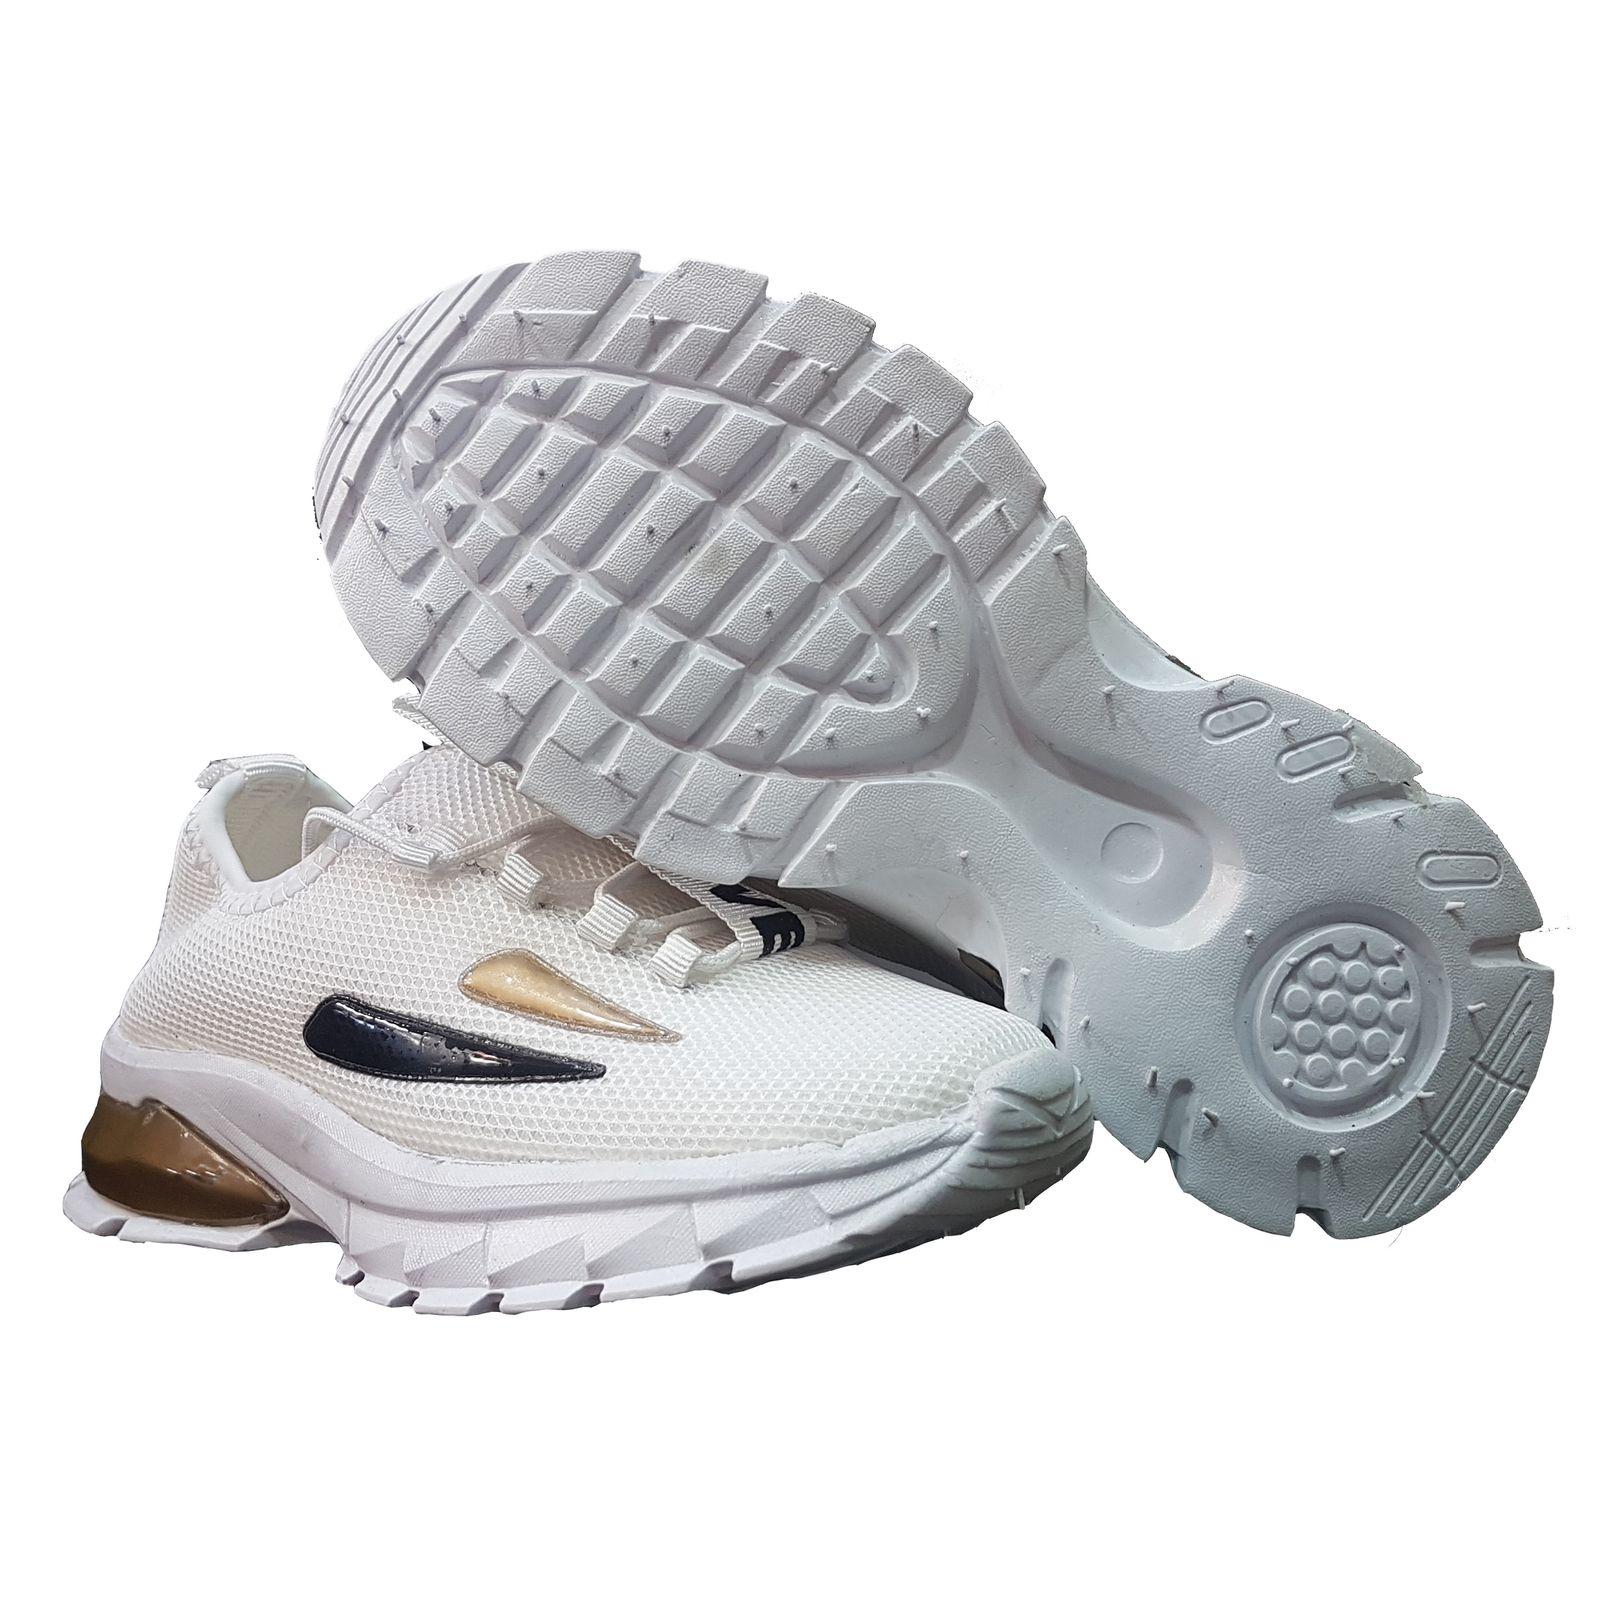 کفش پیاده روی پسرانه کد 3328090 -  - 5